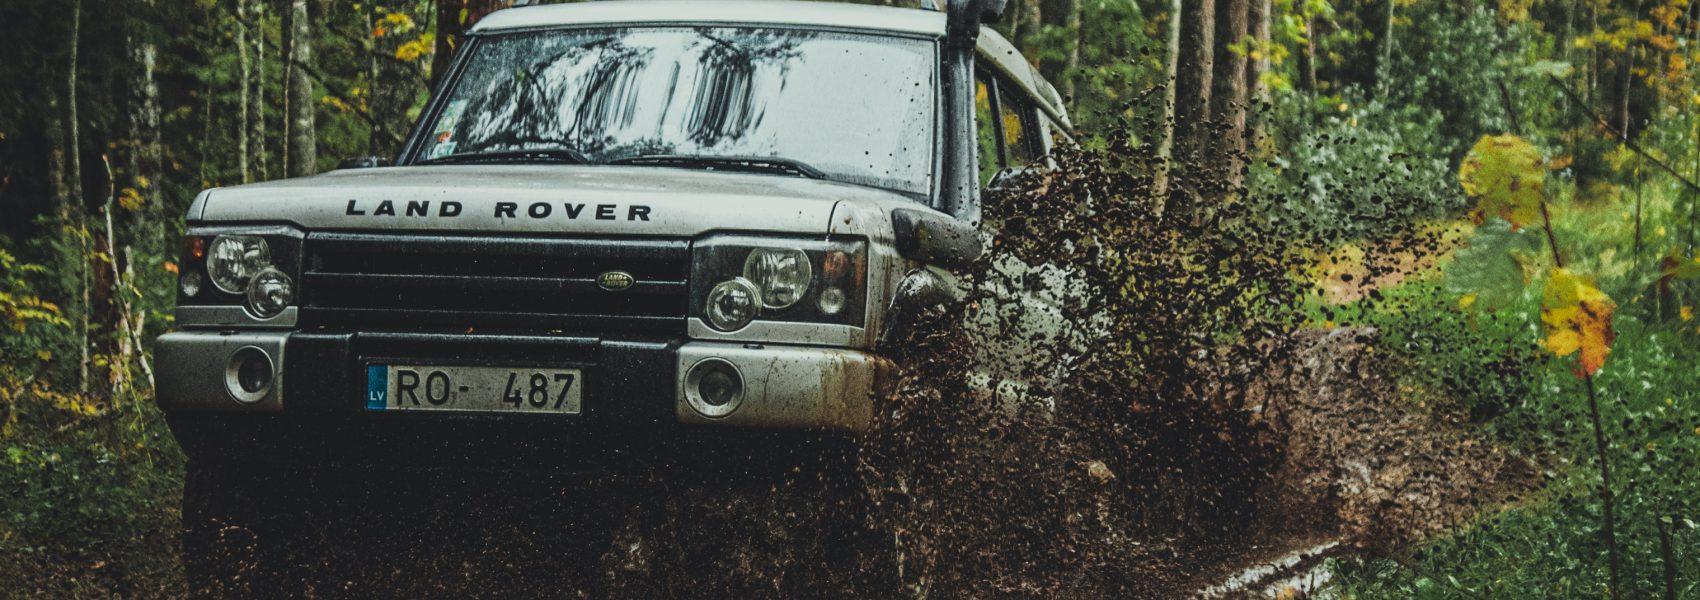 Mud Terrain Tyres Rockhampton